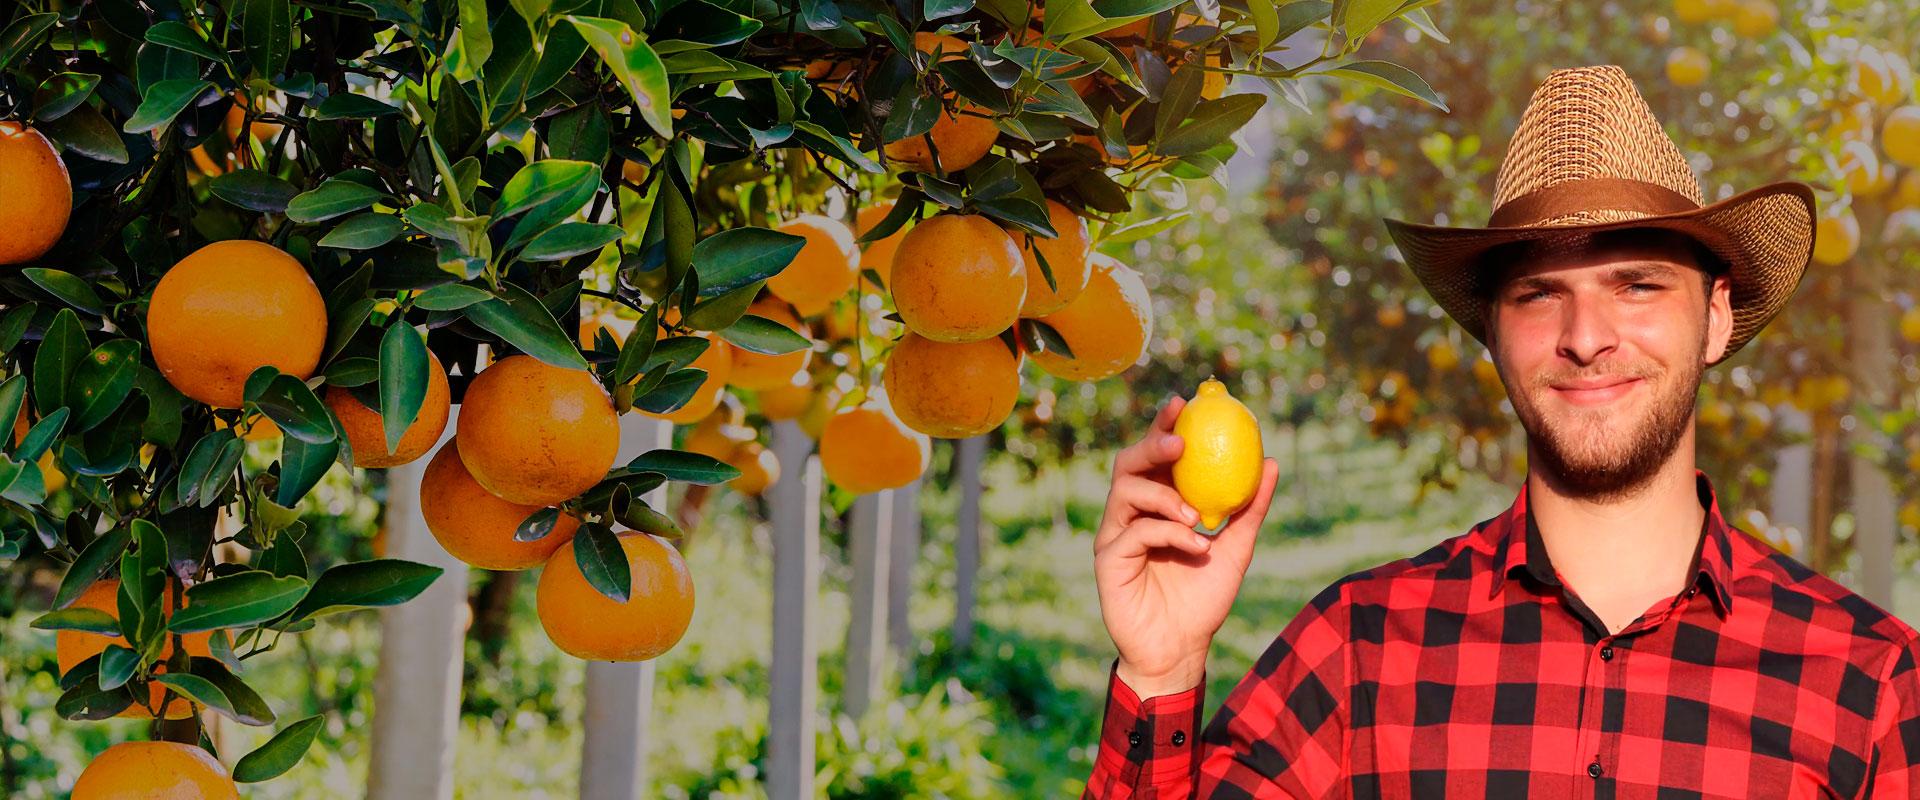 Compra-citricos-a-proovedores-Alicante